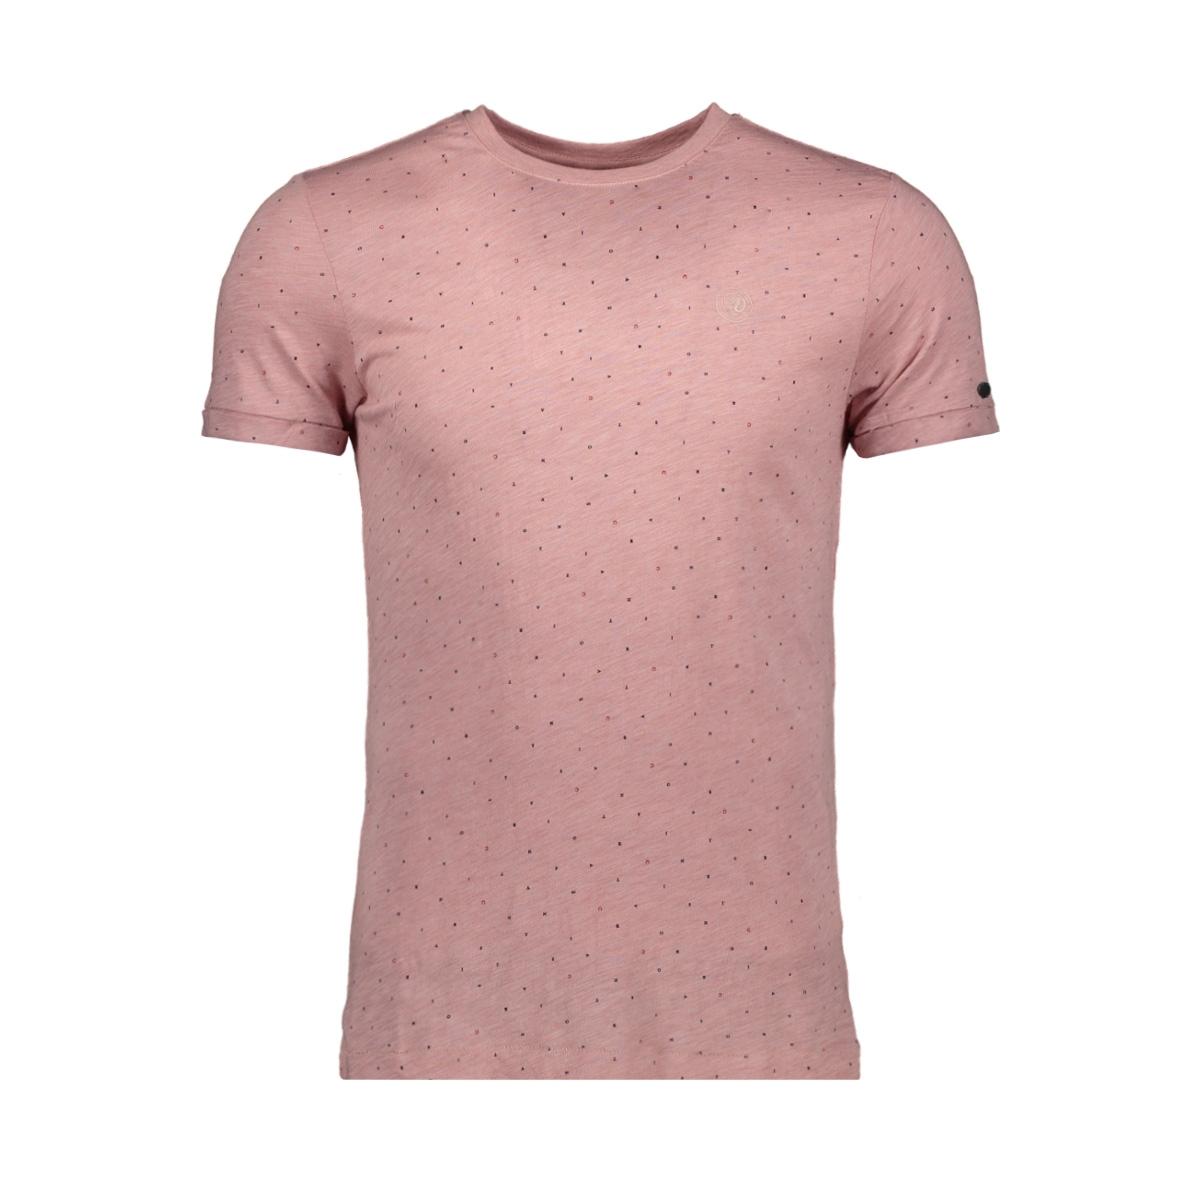 letterprint slub jersey t shirt ctss192305 cast iron t-shirt 4079